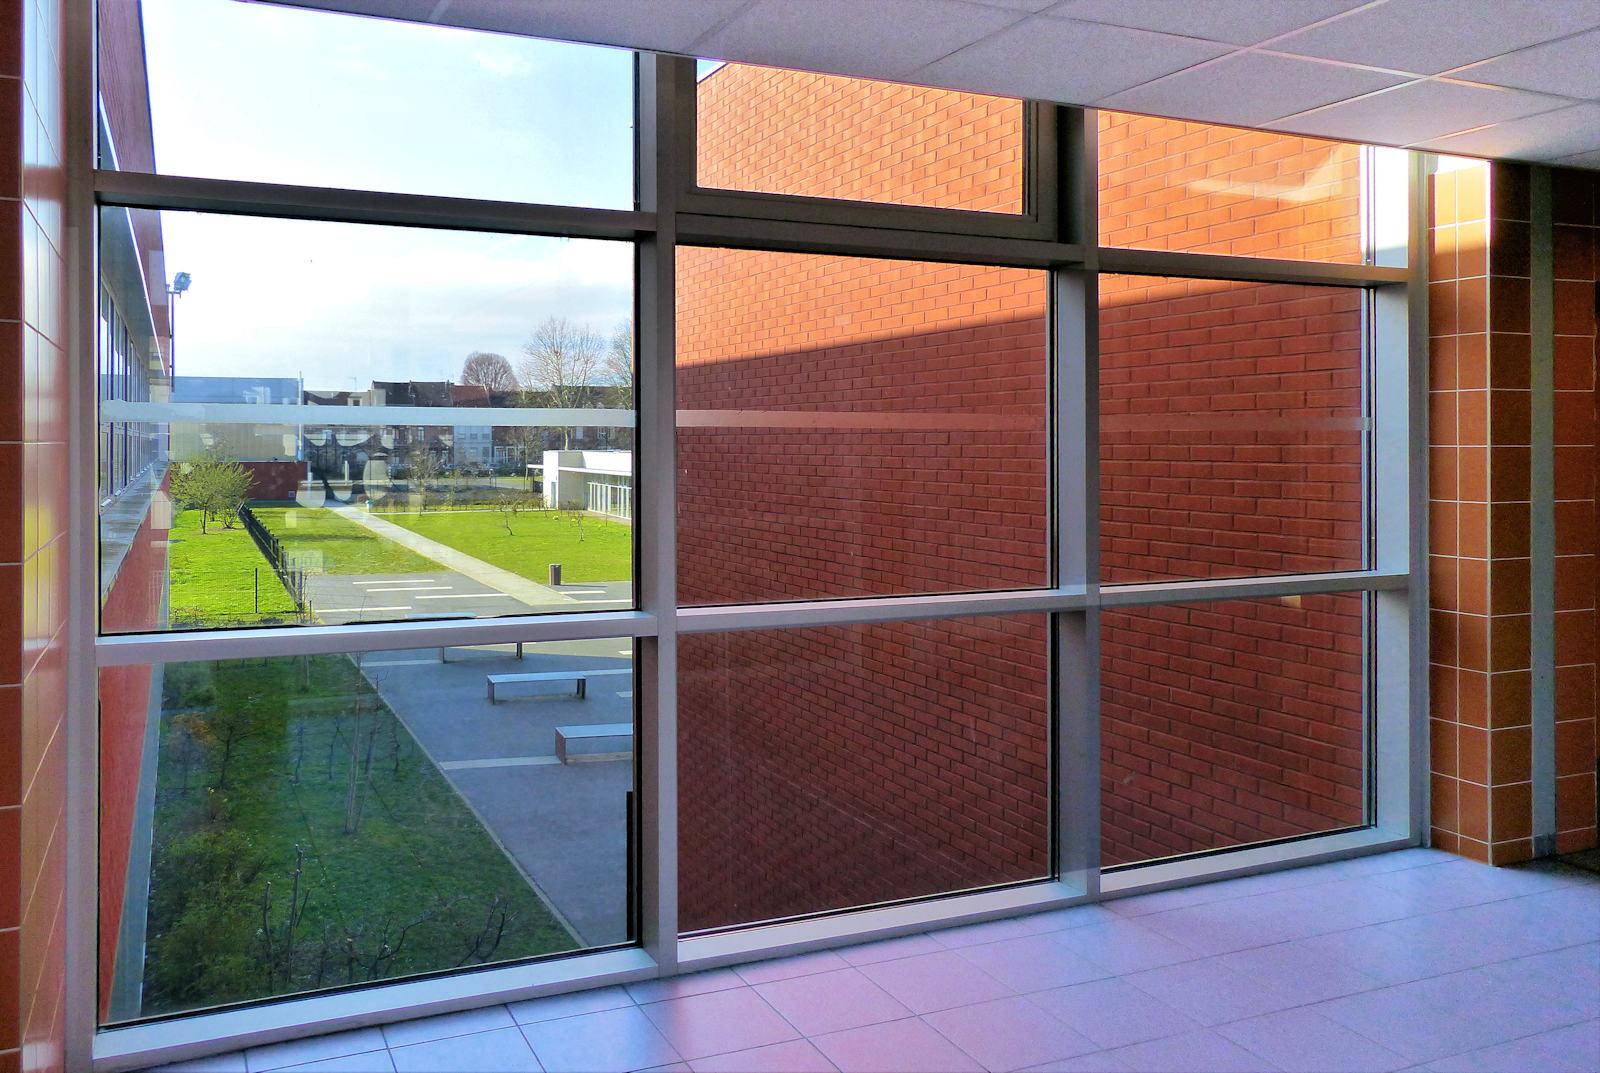 Baies vitrées couloirs Marie Curie